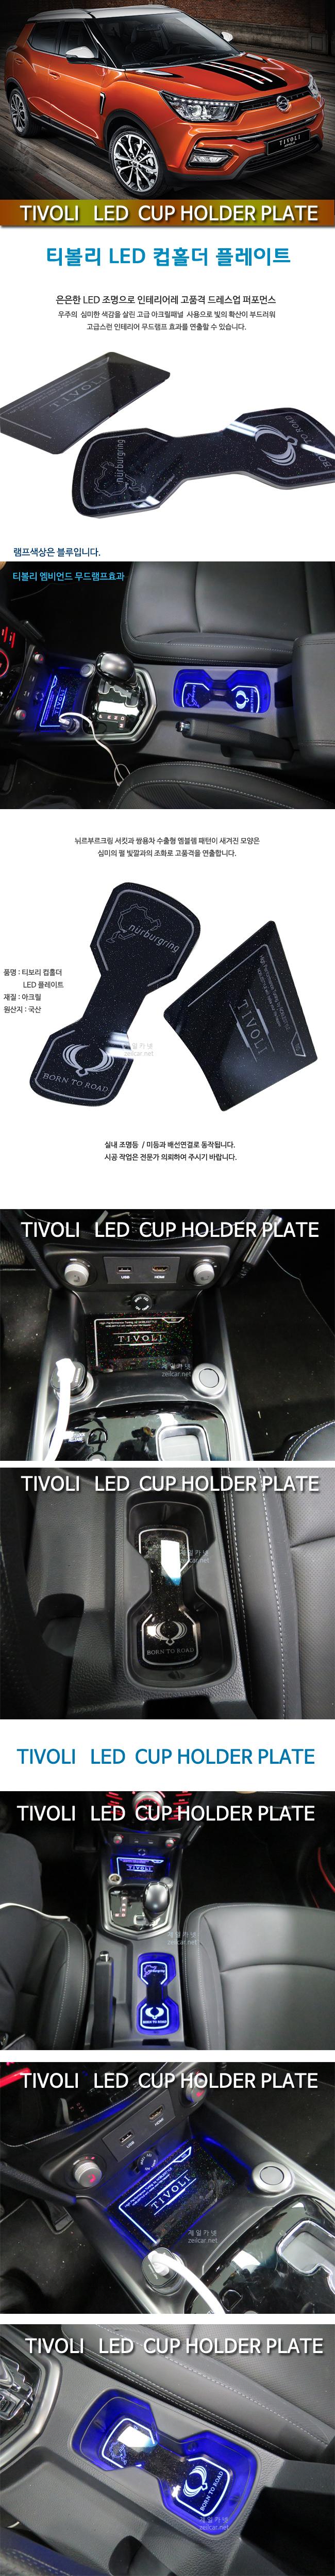 [ZiB2B] 티볼리 전용 LED 컵홀더 플레이트 [Zi0906]